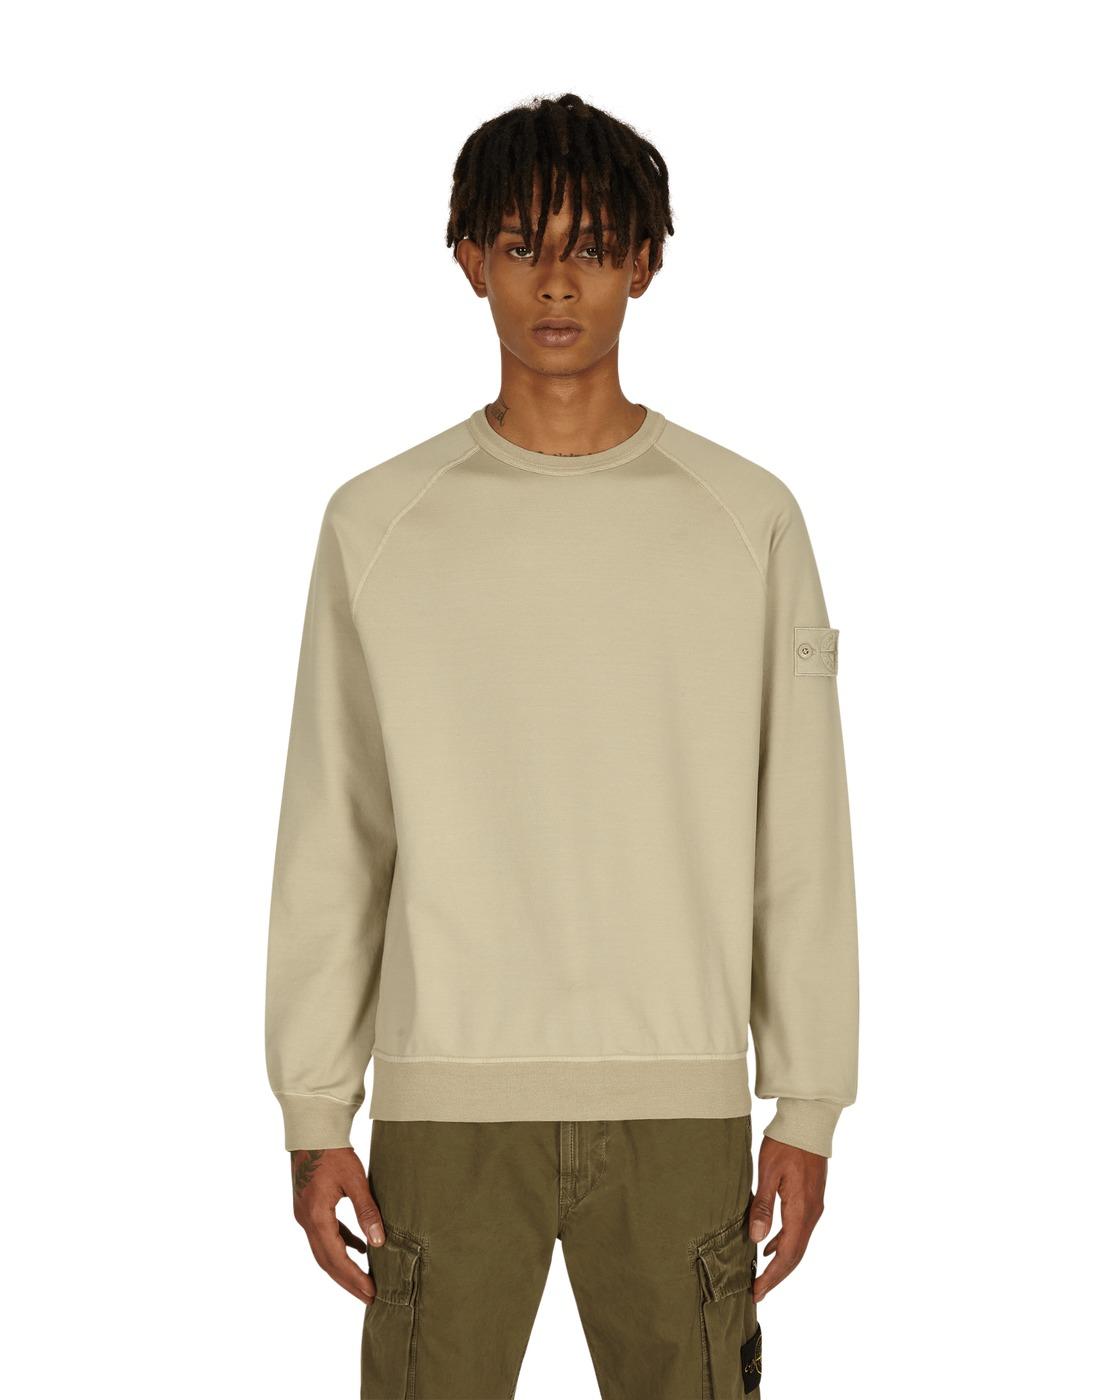 Stone Island Ghost Piece Crewneck Sweatshirt Beige